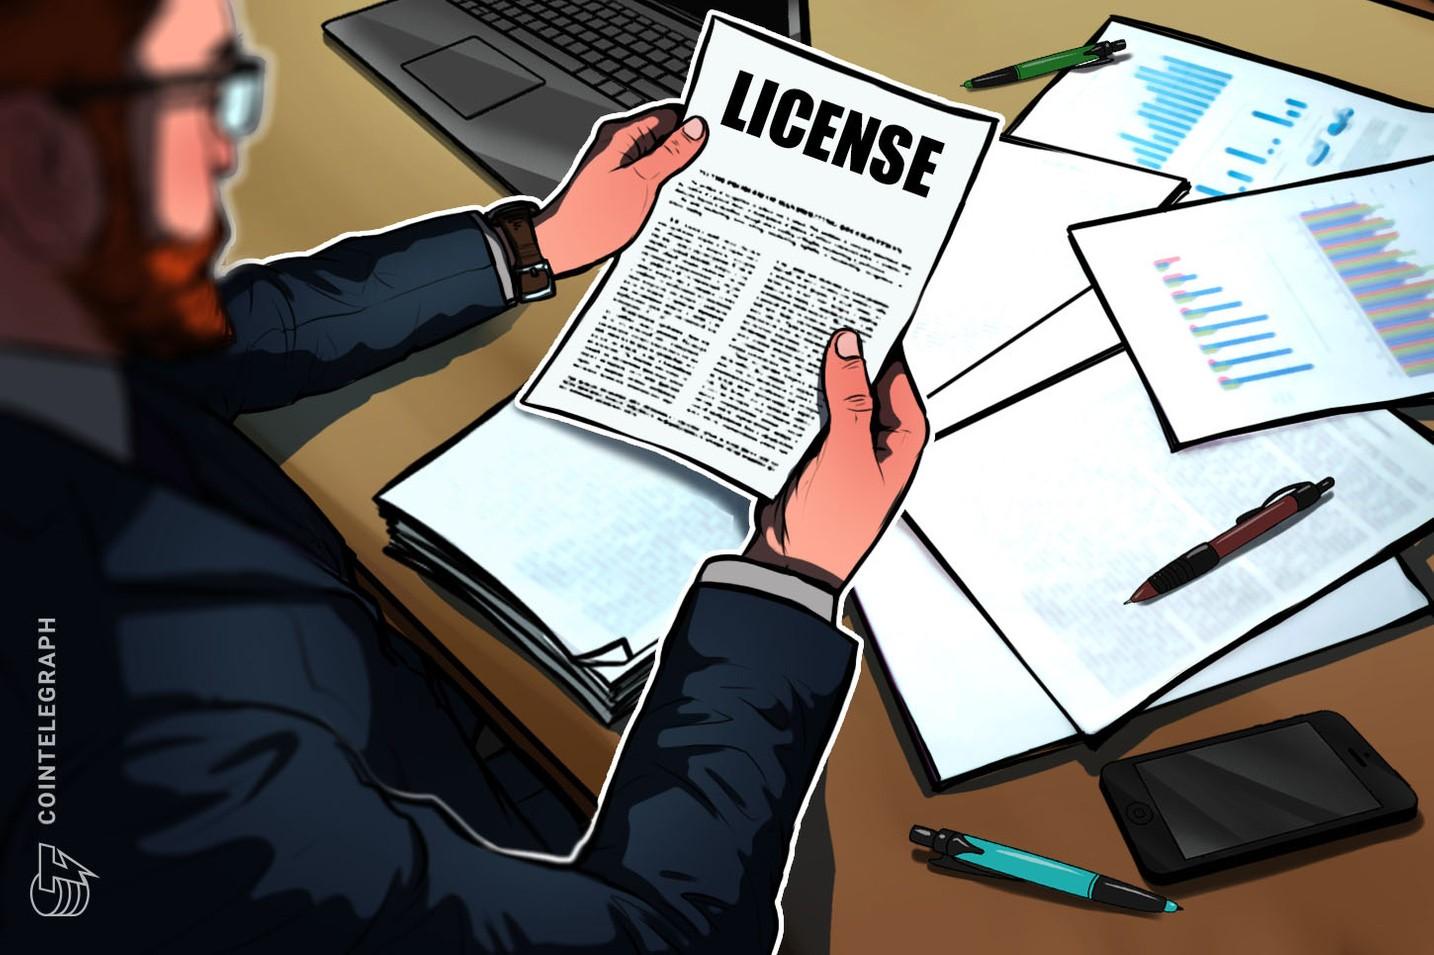 Crypto.com به اولین پلتفرم ارز دیجیتال برای دریافت گواهی MFSA کلاس 3 تبدیل می شود